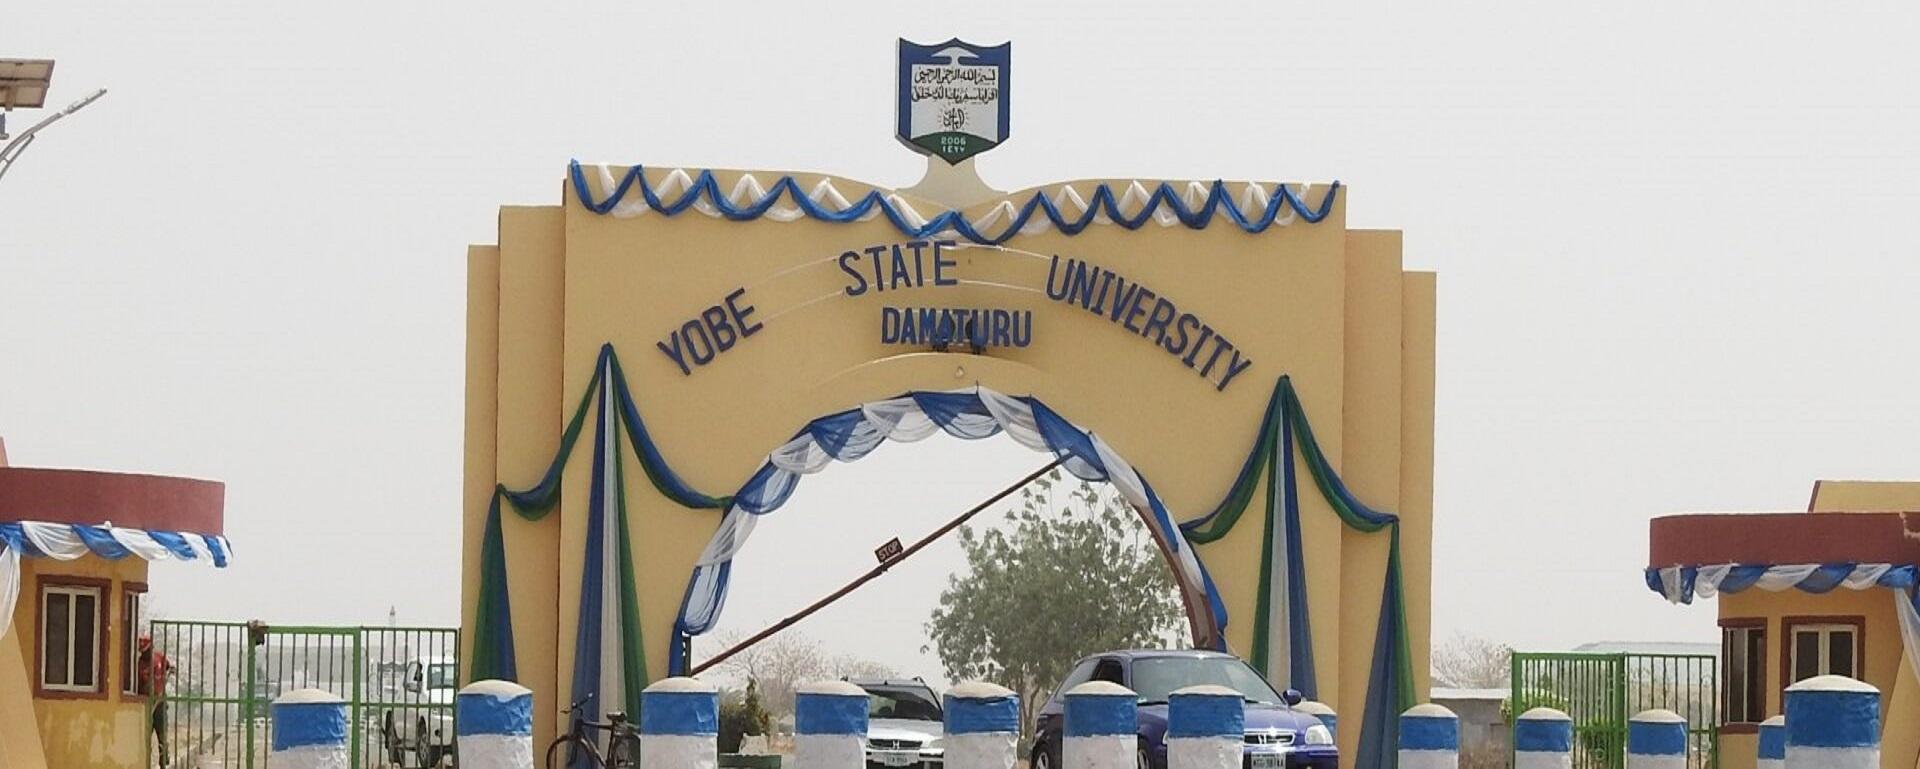 Welcome to Yobe State University